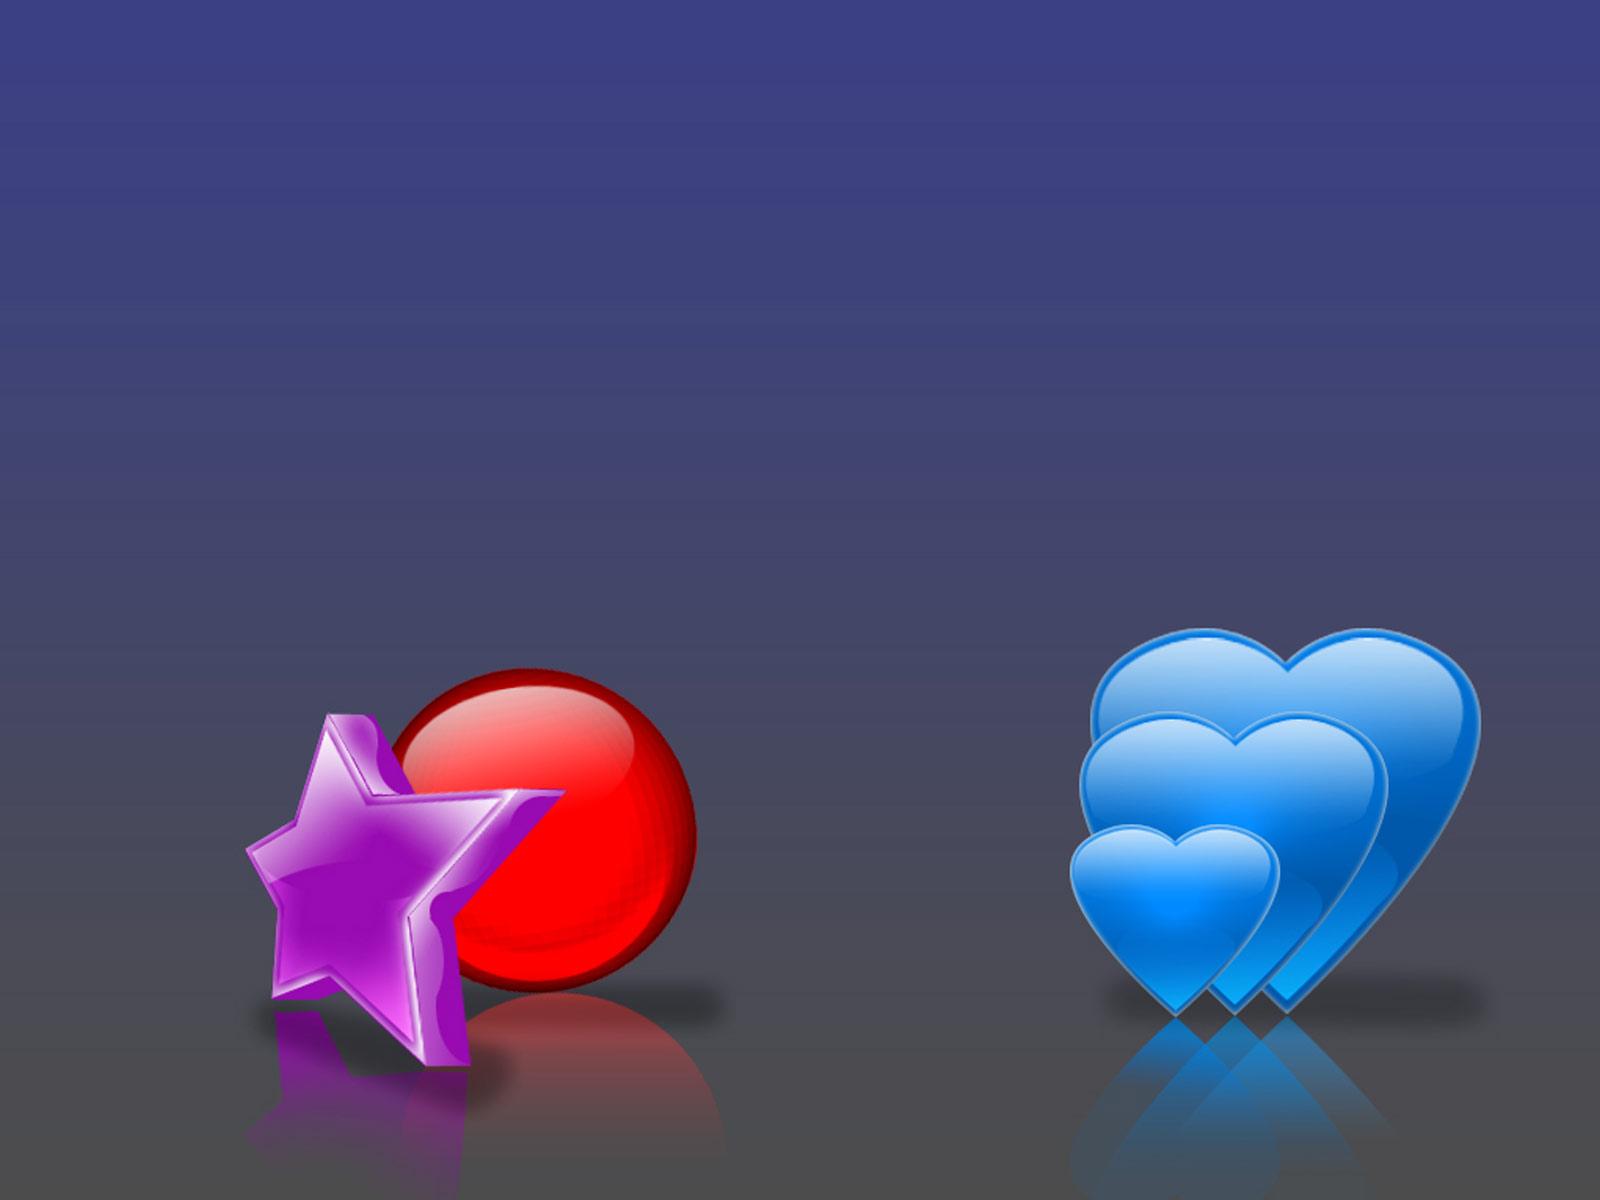 http://4.bp.blogspot.com/-kIYF6p6i0C0/TyLGG_GR8iI/AAAAAAAAAlw/gmGSQG5BPtE/s1600/valentines-day-wallpapers-114.jpg